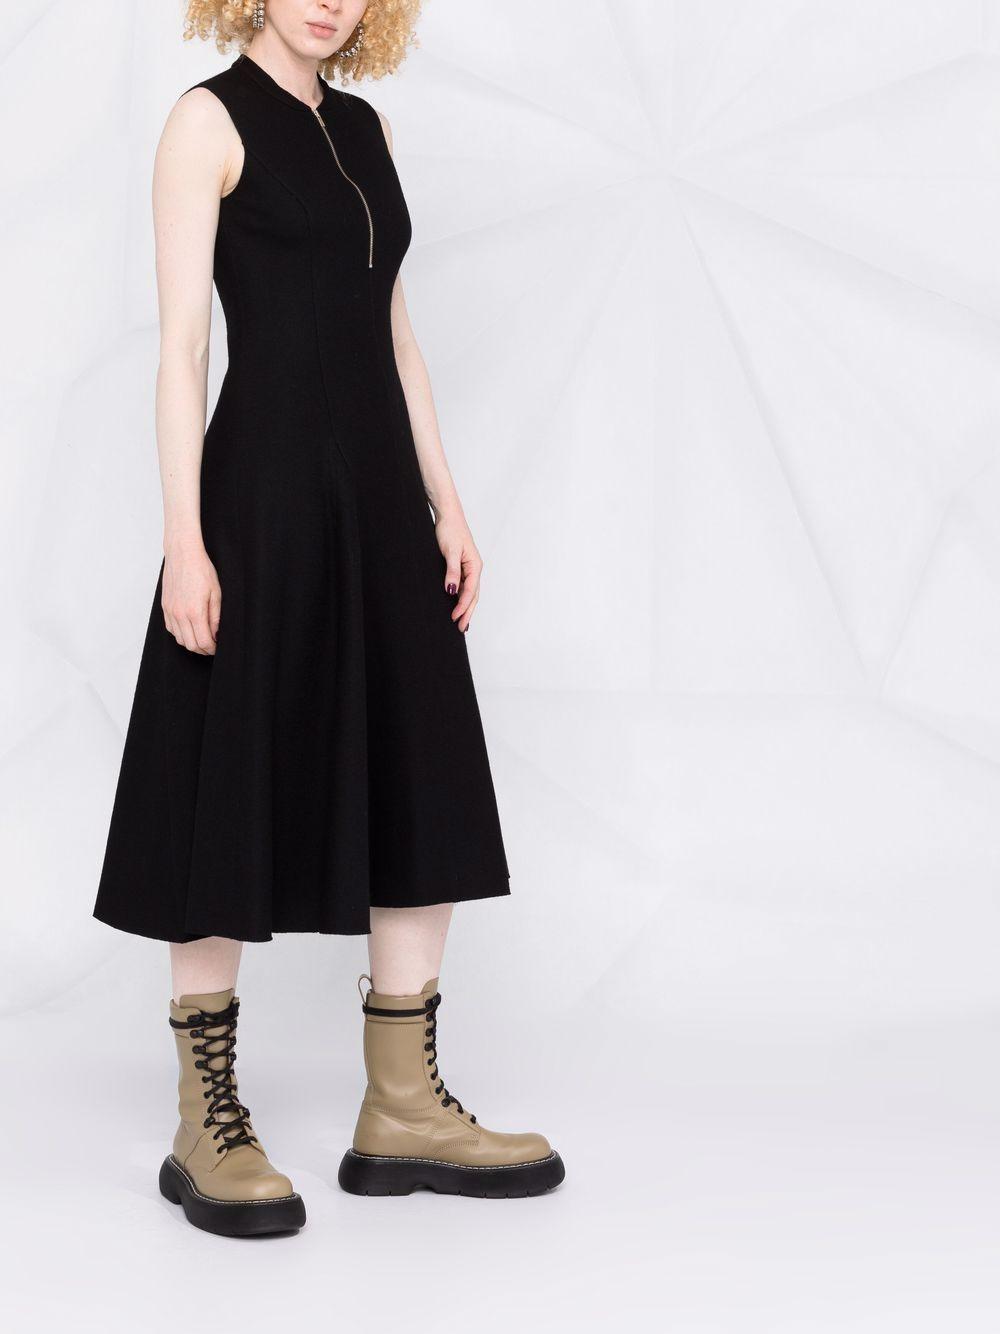 Picture of Erika Cavallini | Sleeveless Wool Midi Dress